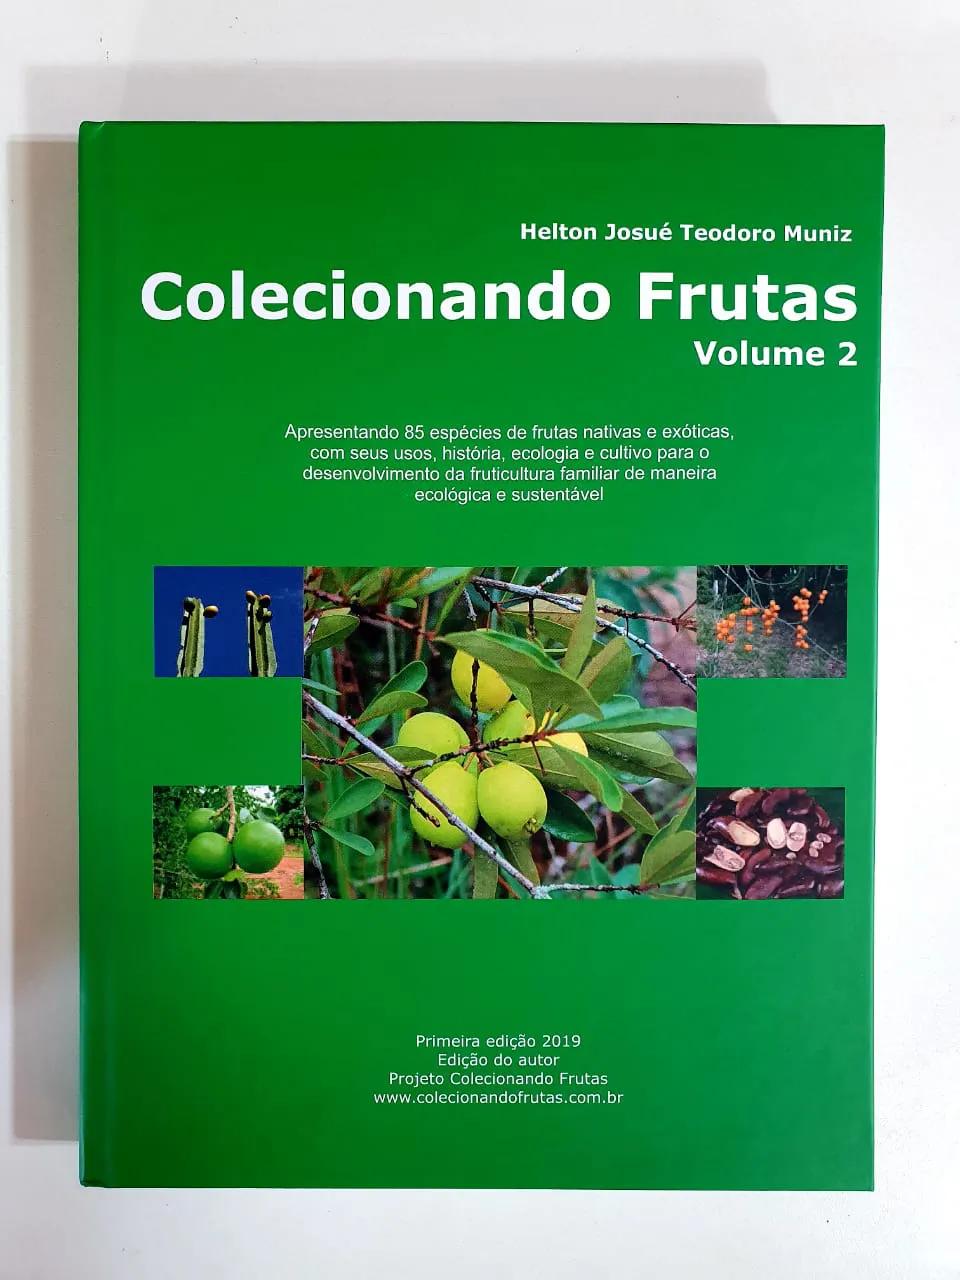 LIVRO COLECIONANDO FRUTAS VOLUME 2